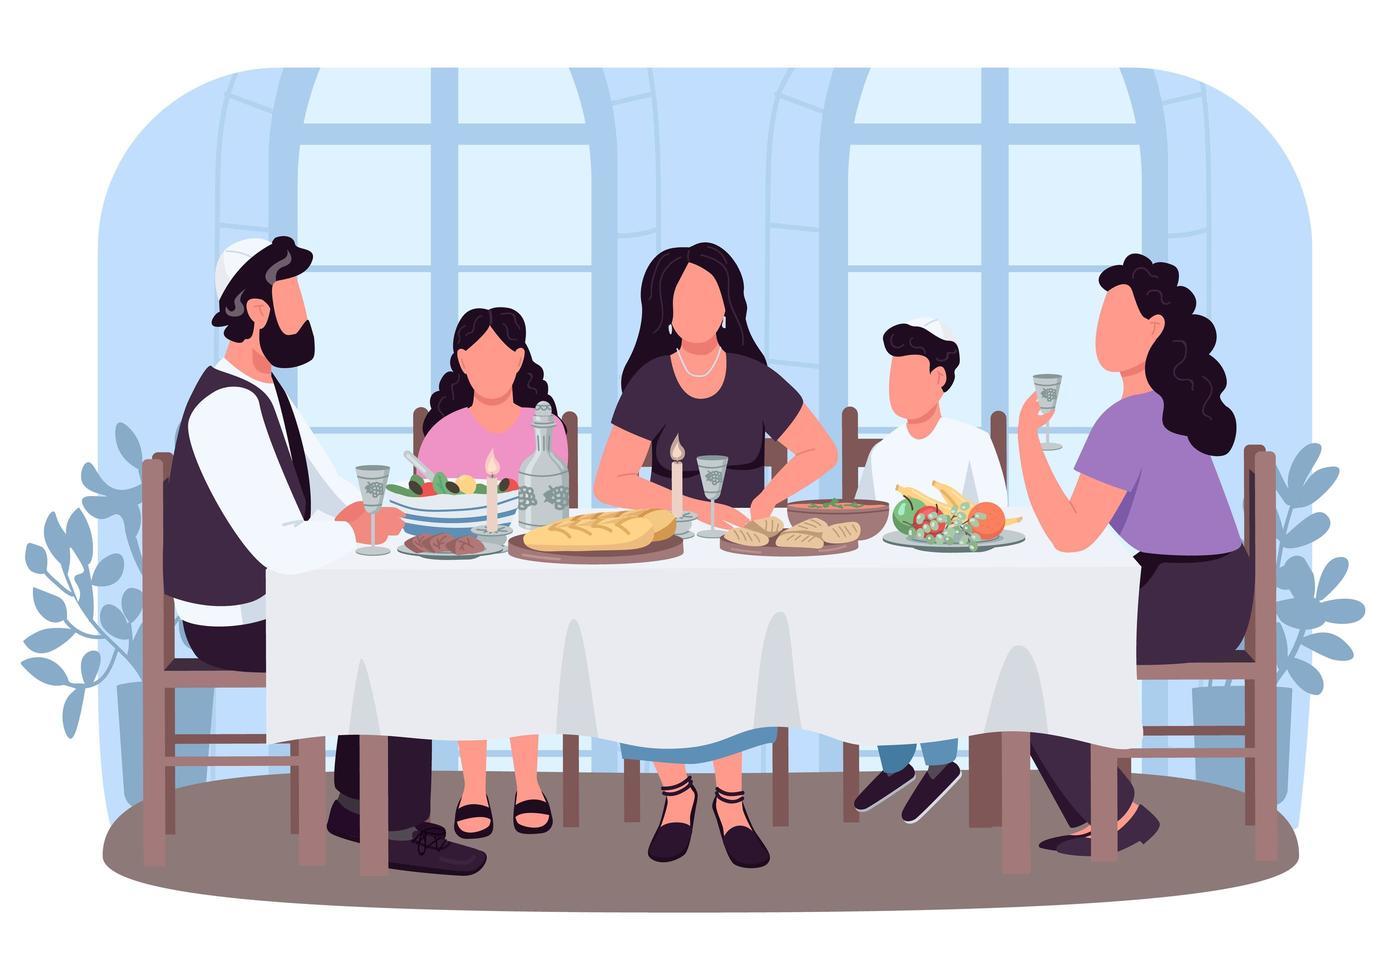 judisk kultur 2d vektor webbbanner, affisch